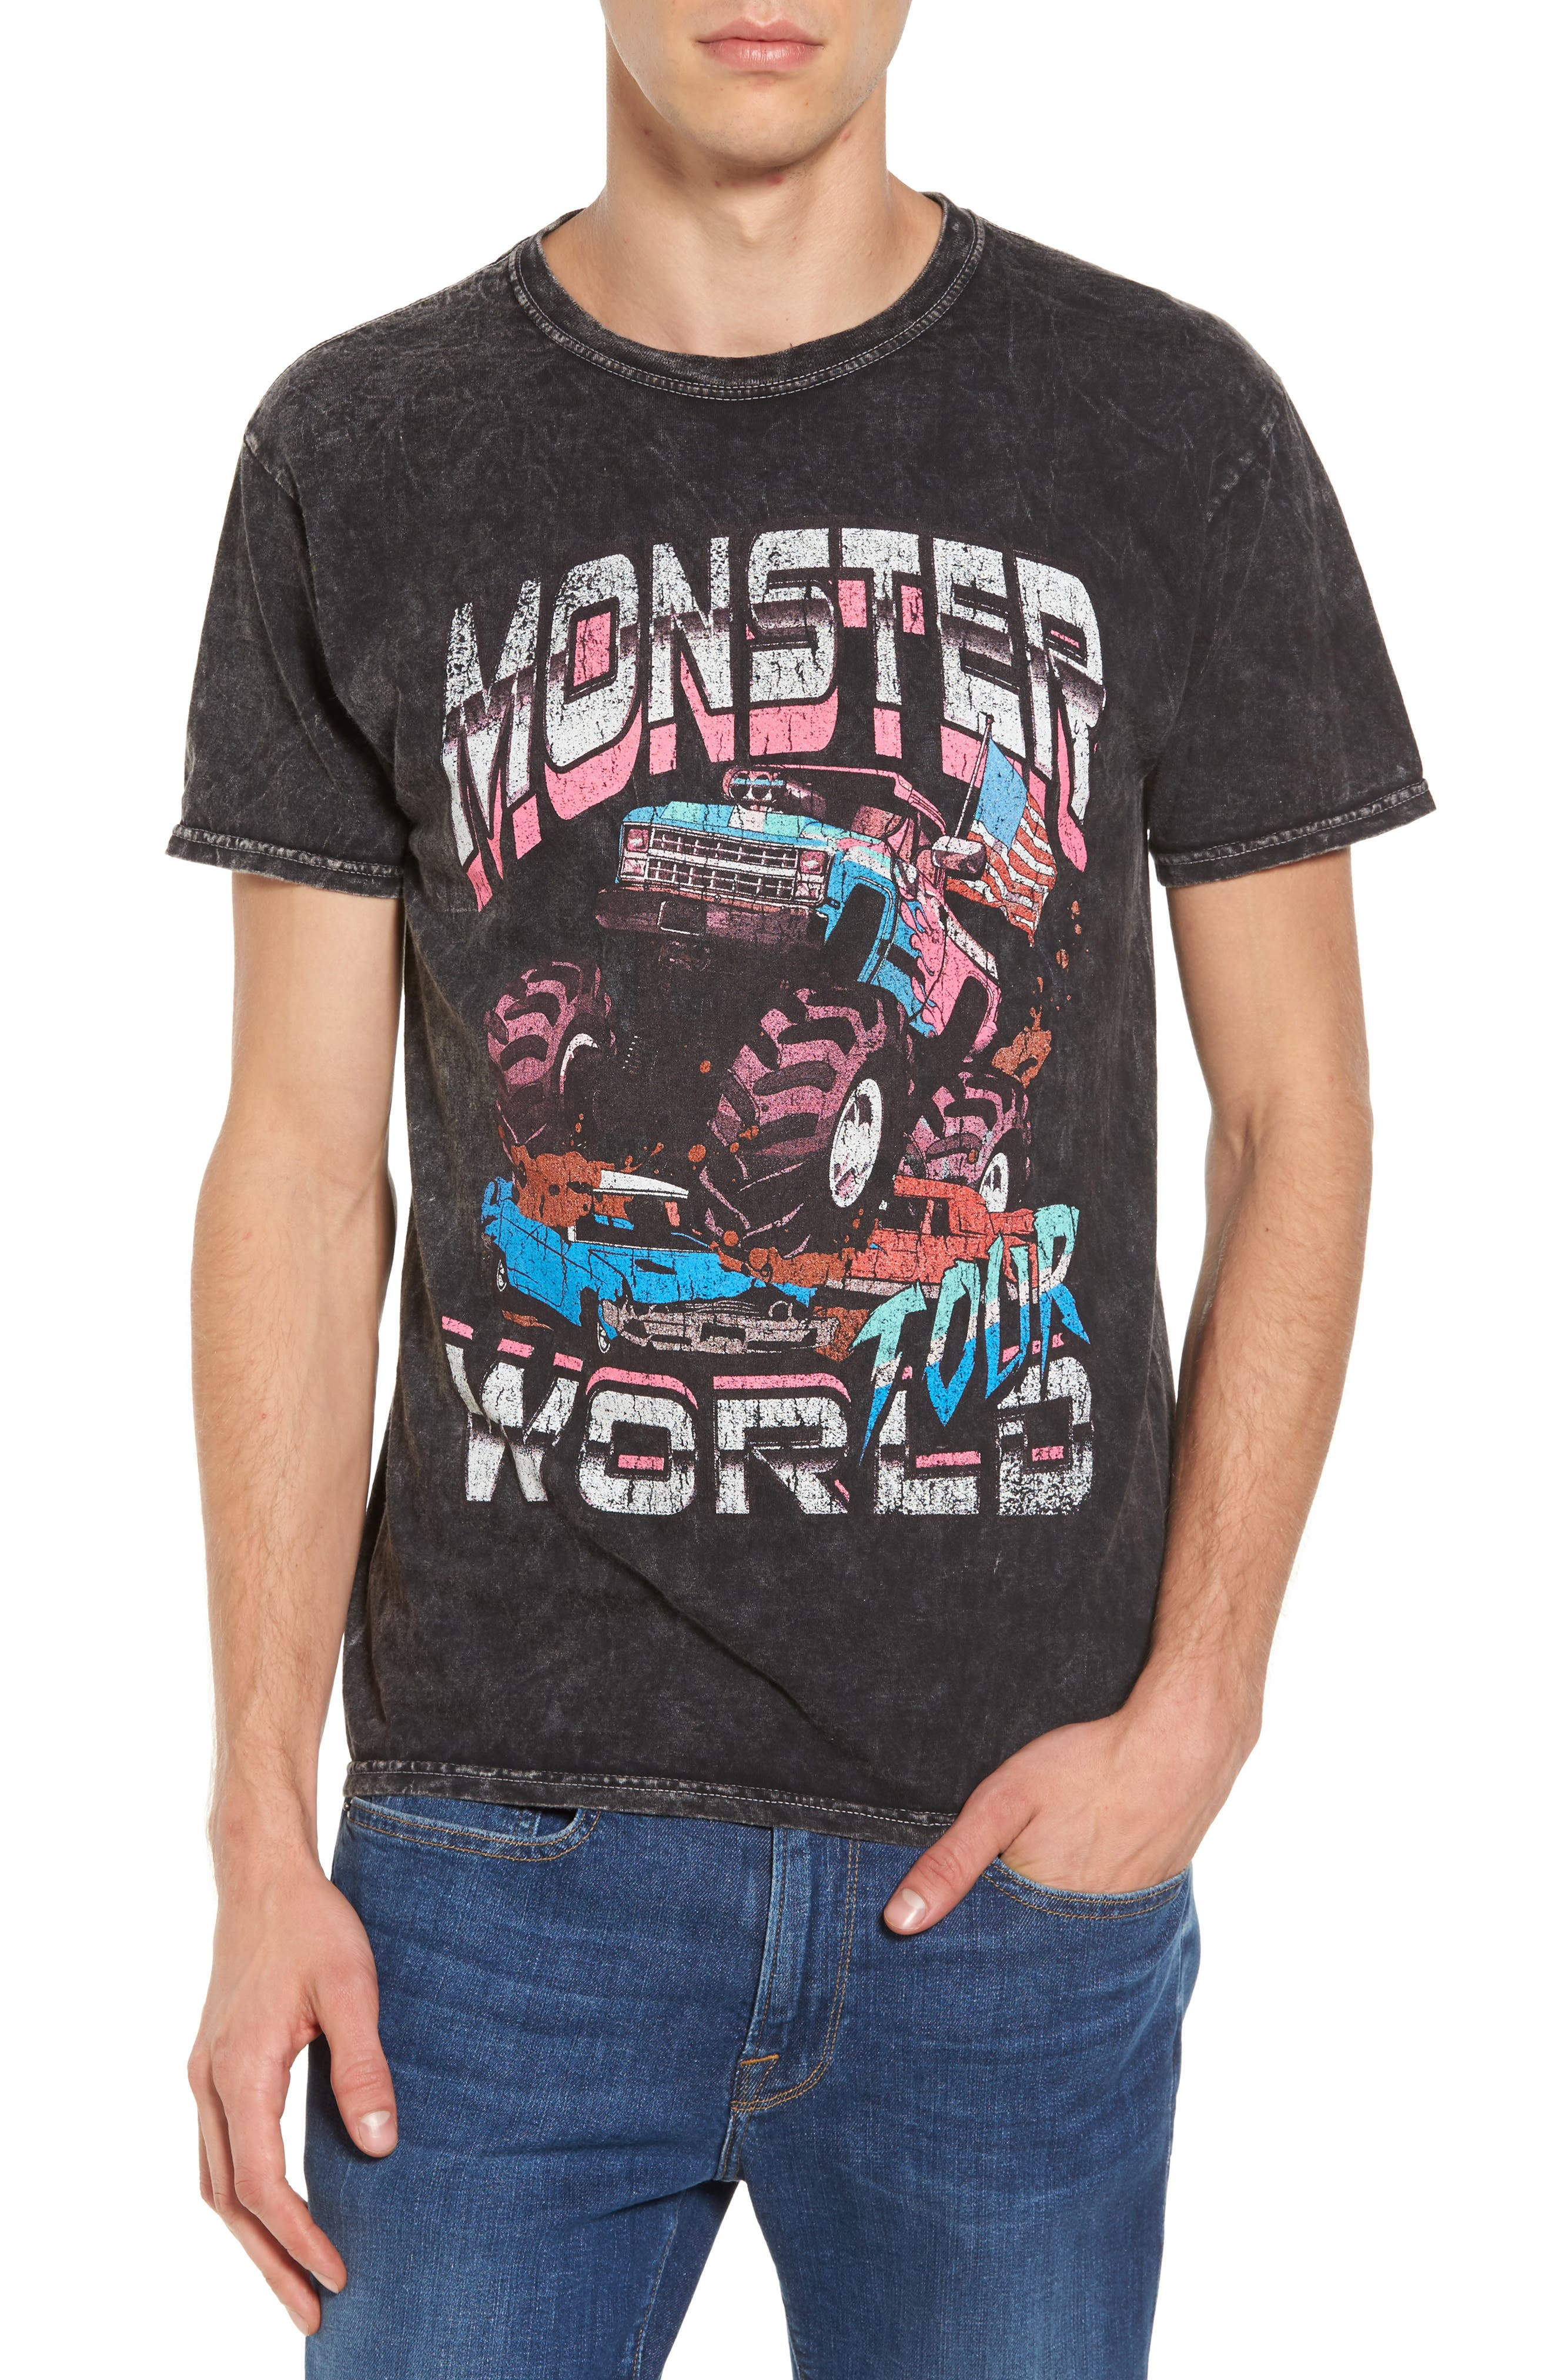 Main Image - The Rail Monster World Graphic T-Shirt